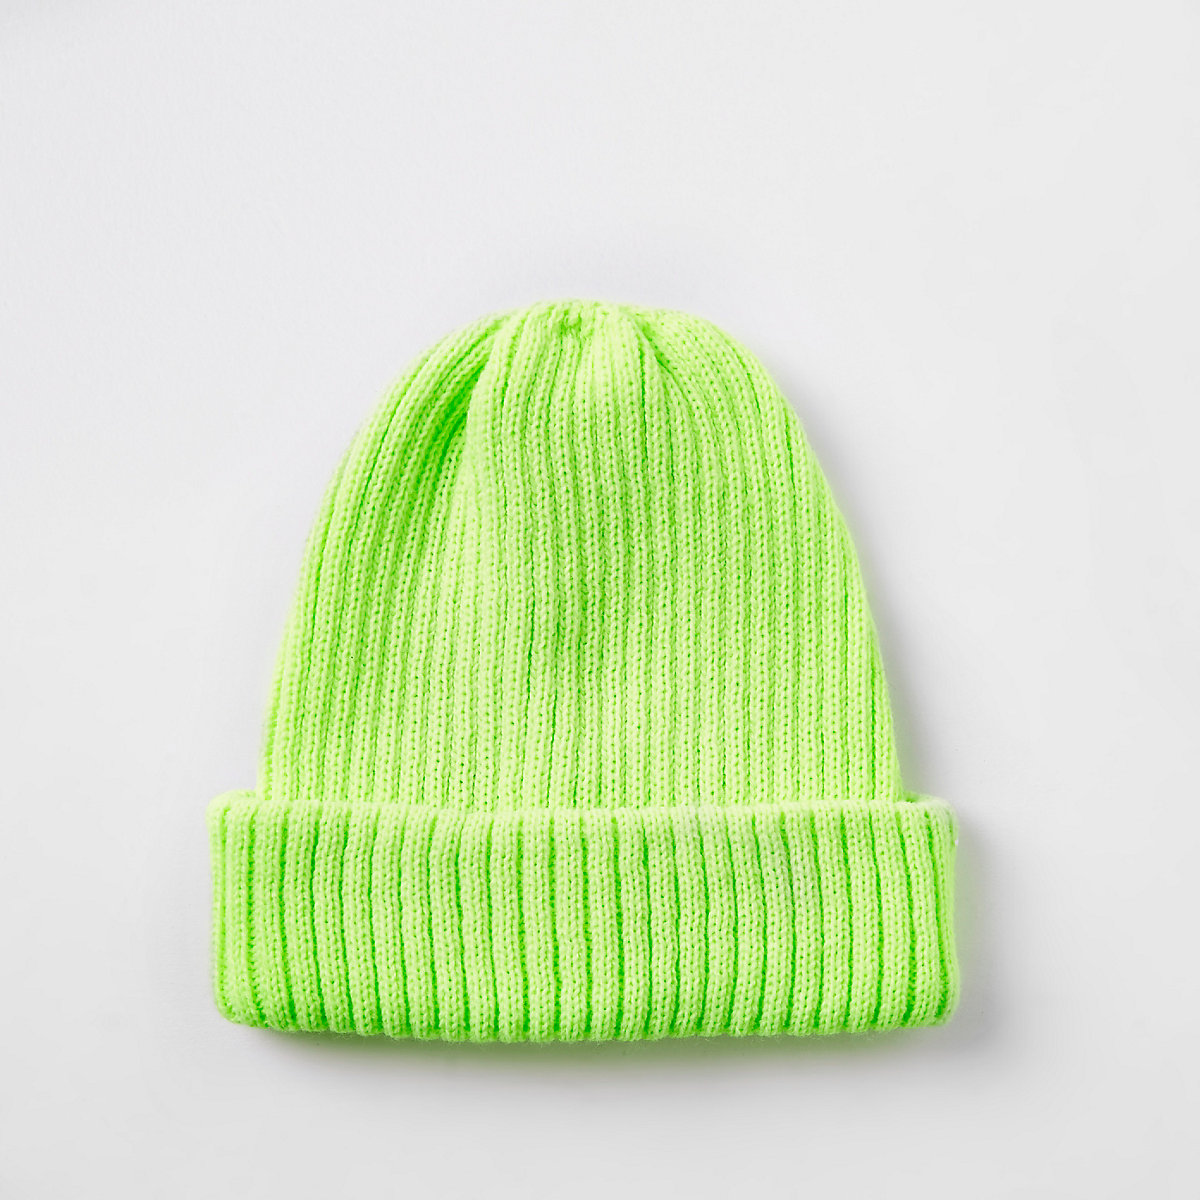 Neon yellow fisherman knit beanie hat